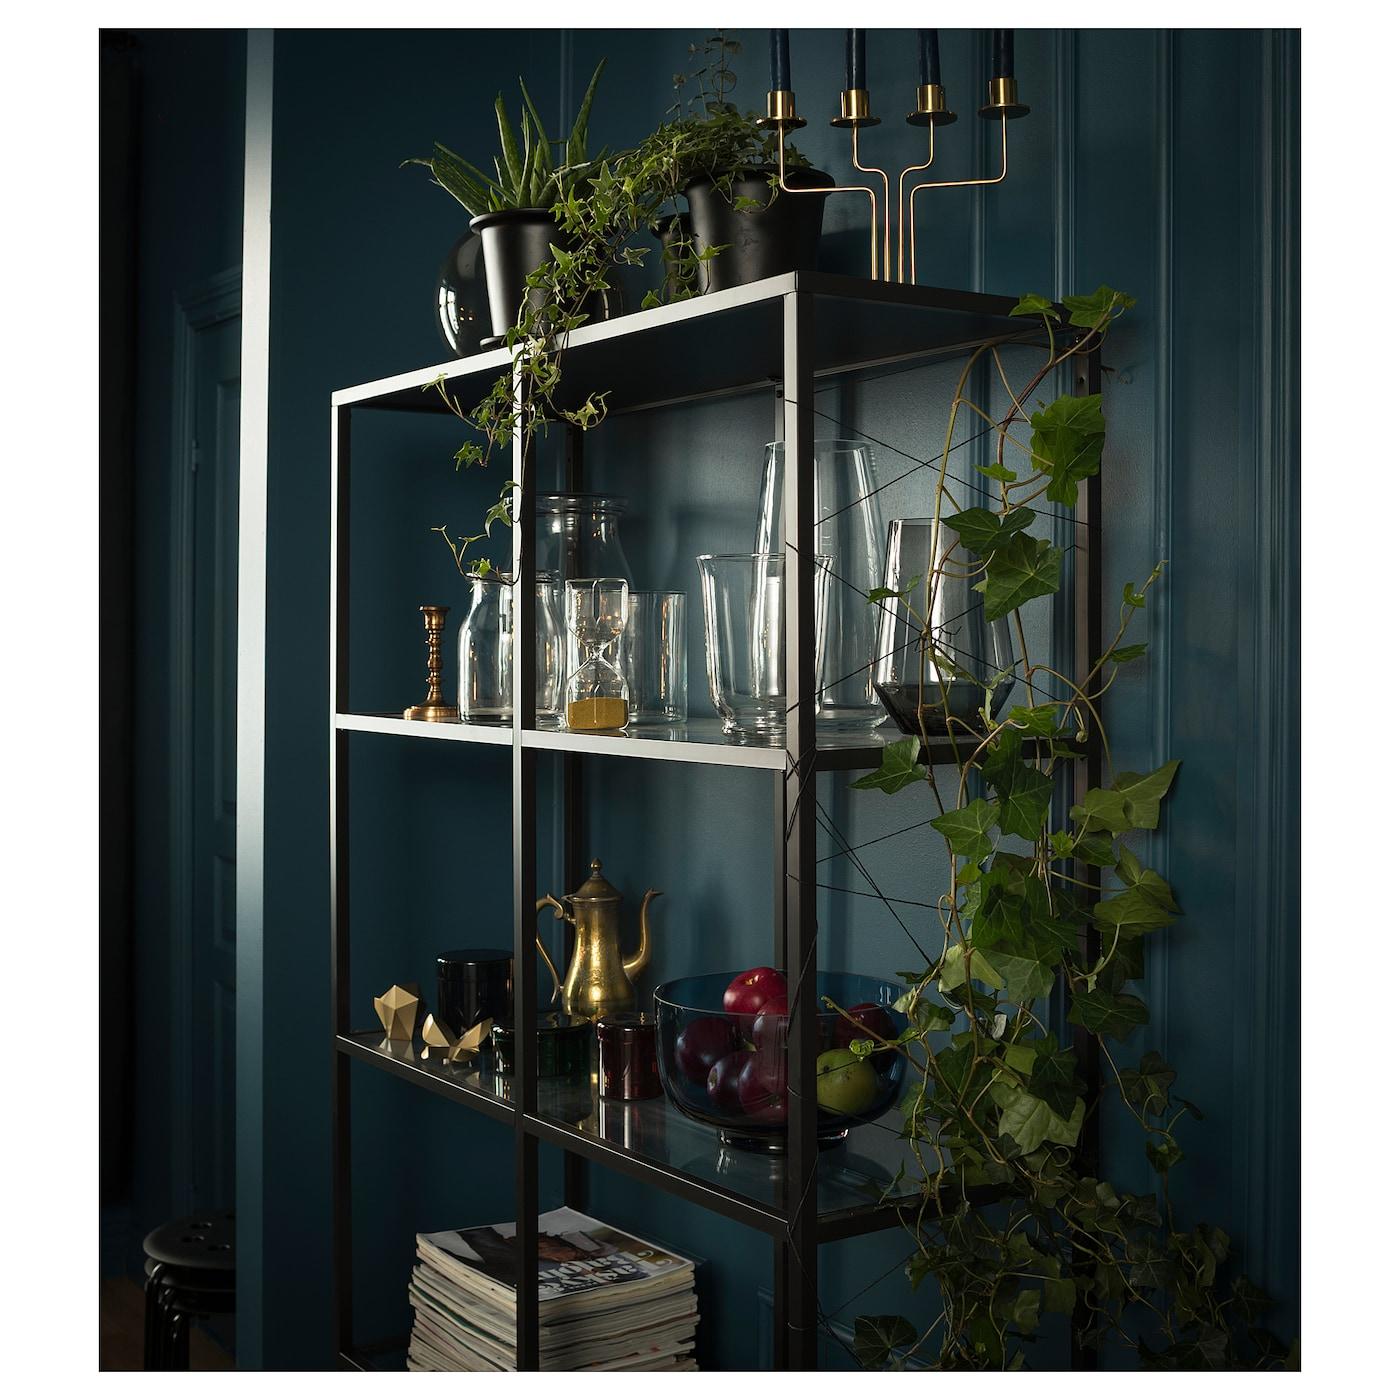 Zwarte Kast Met Glas.Vittsjo Stellingkast Zwartbruin Glas 100 X 175 Cm Ikea